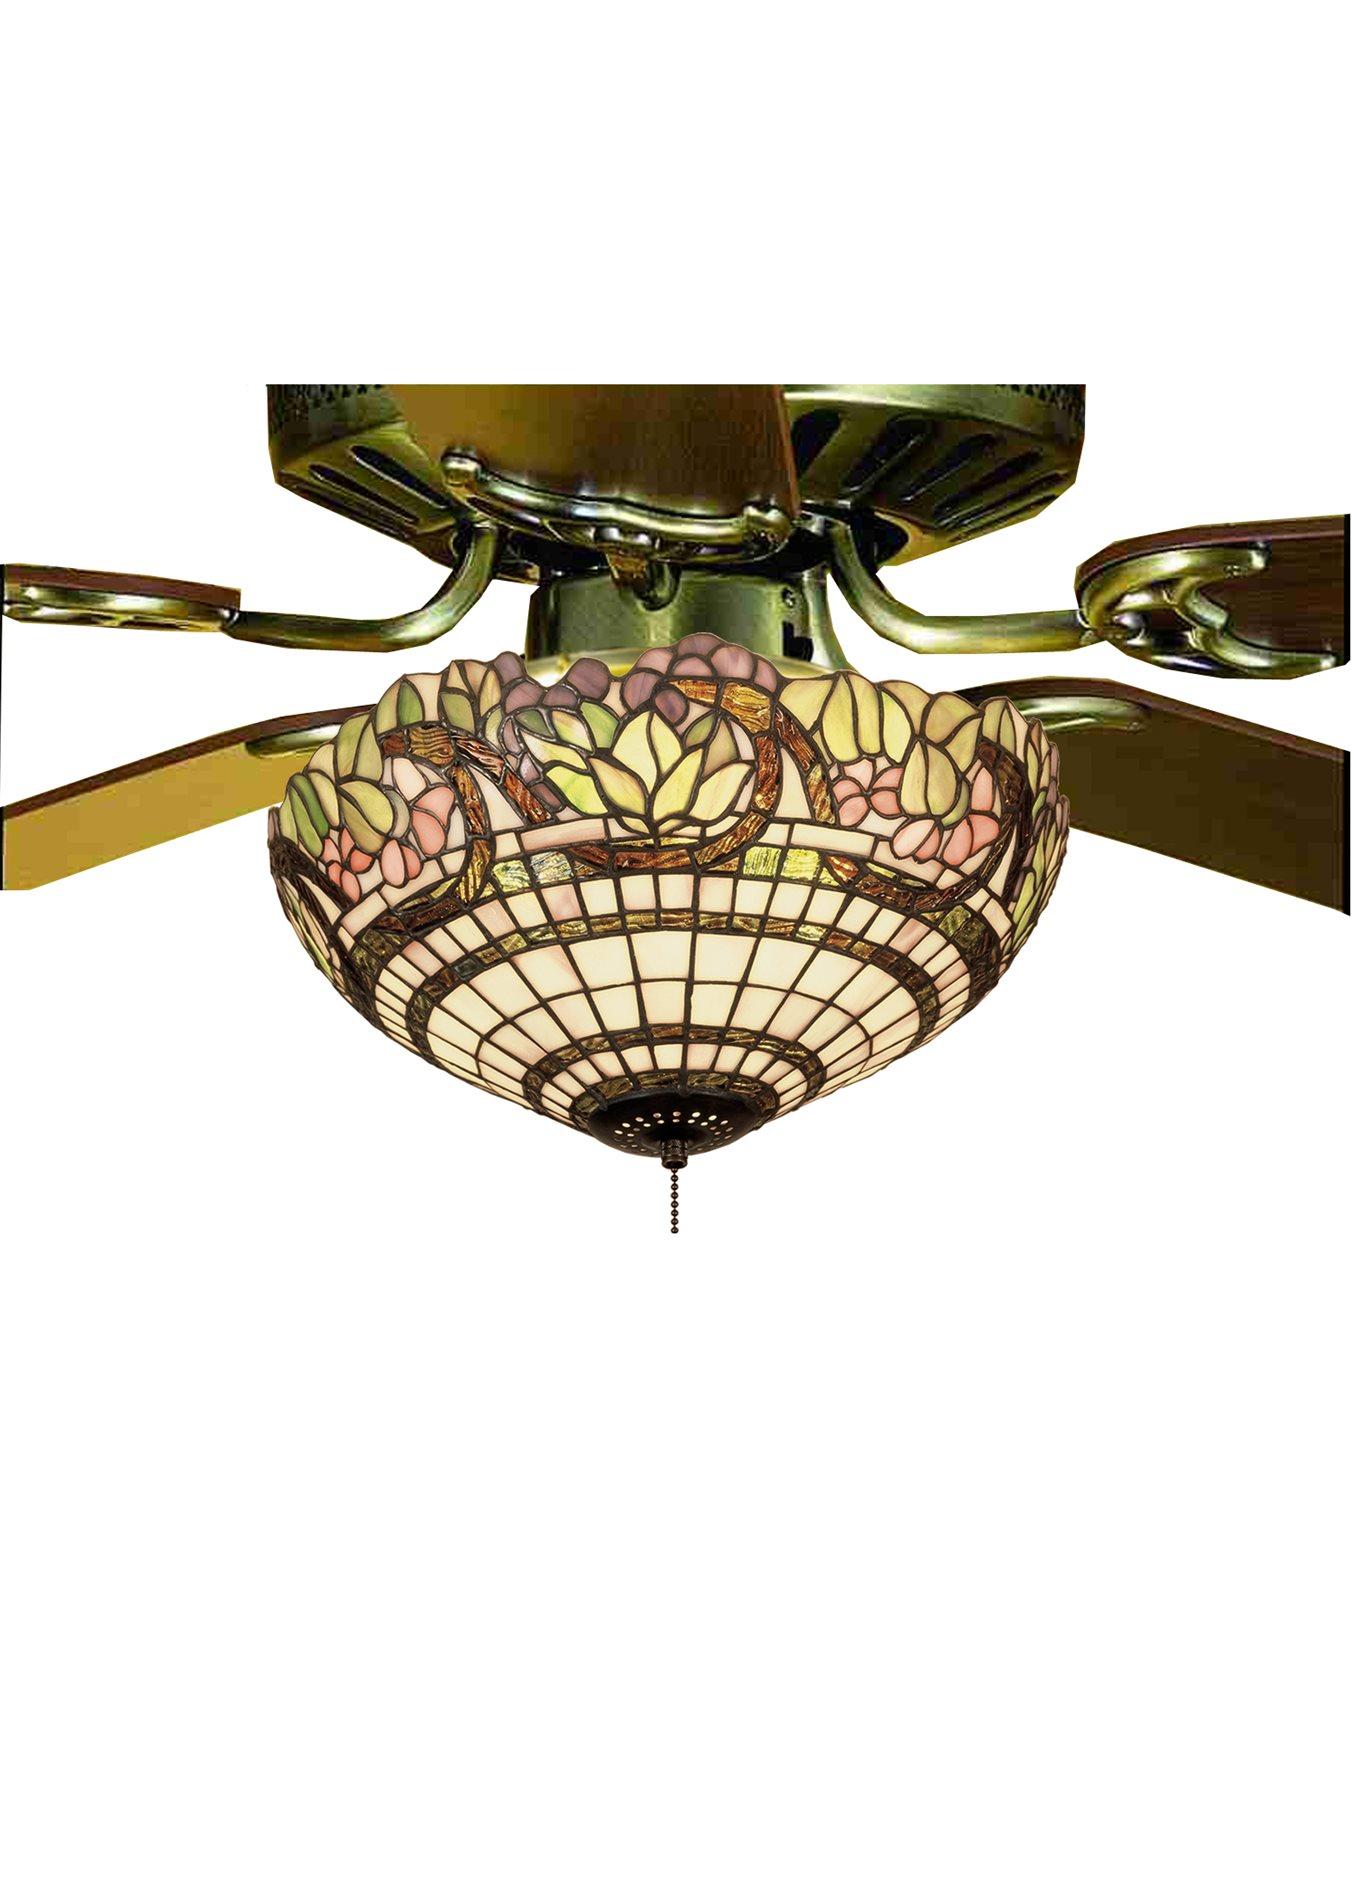 Meyda Tiffany 12706 Handel Grapevine Tiffany Light Kit Md